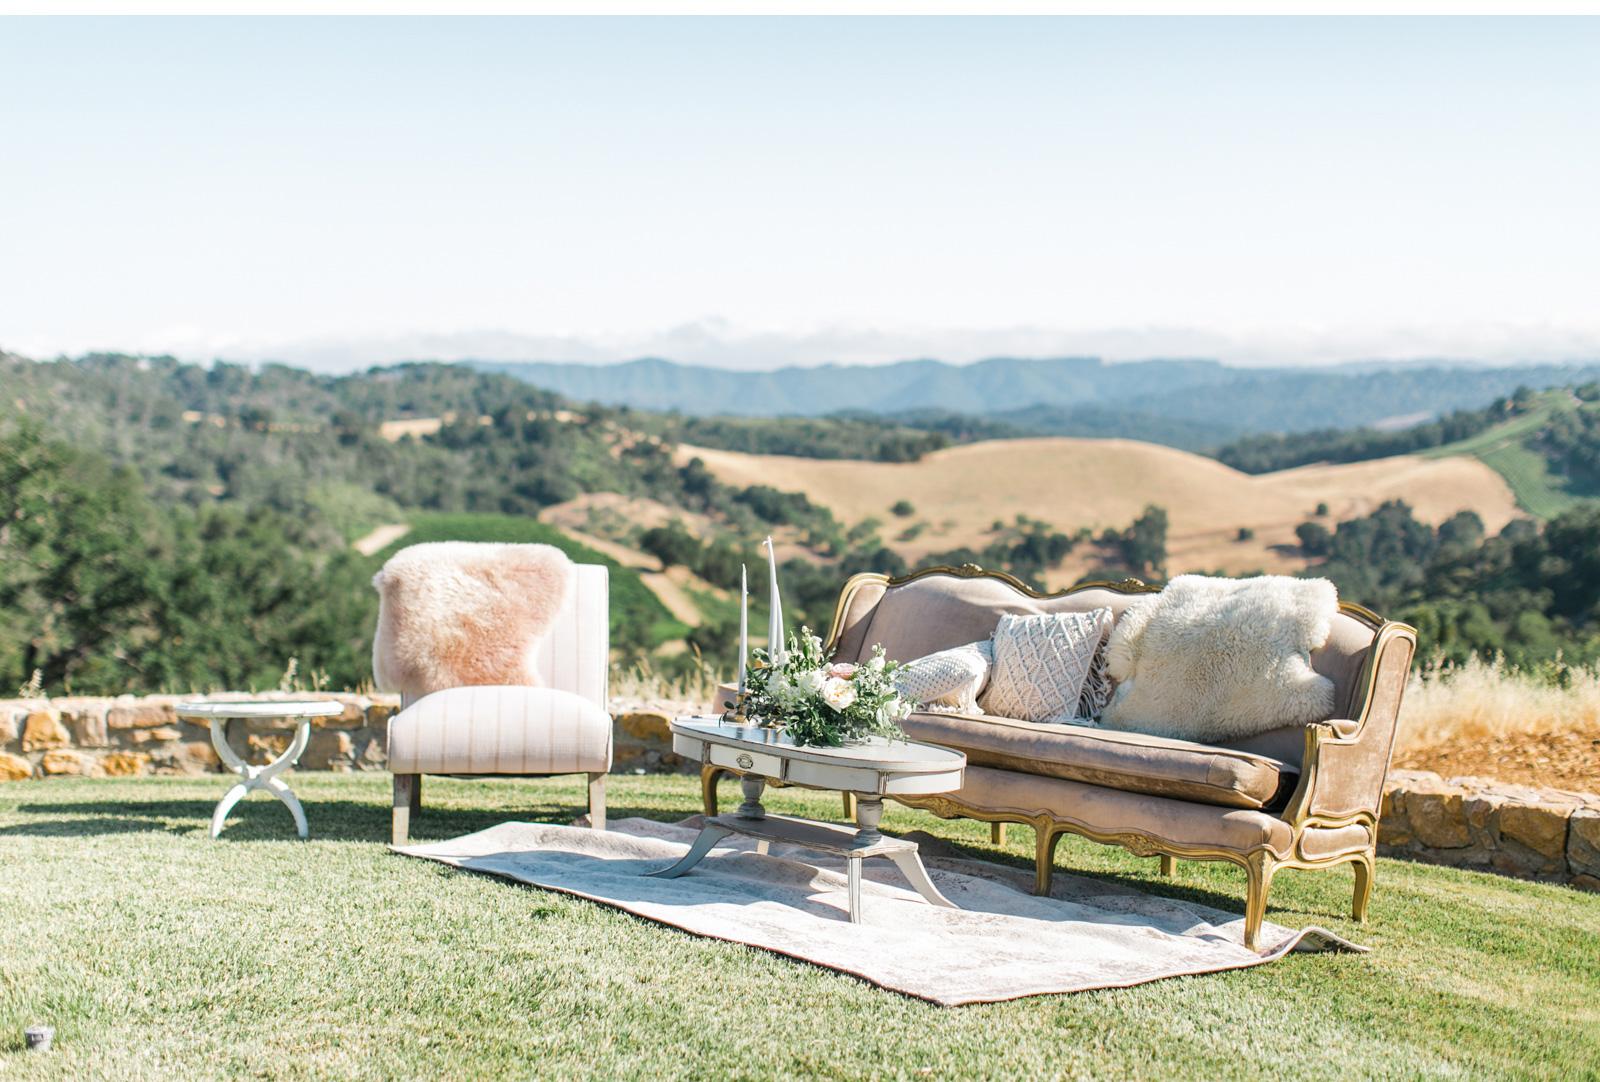 Santa-Ynez-Wedding-Photographer-Sunstone-Winery-Natalie-Schutt-Photography_05.jpg